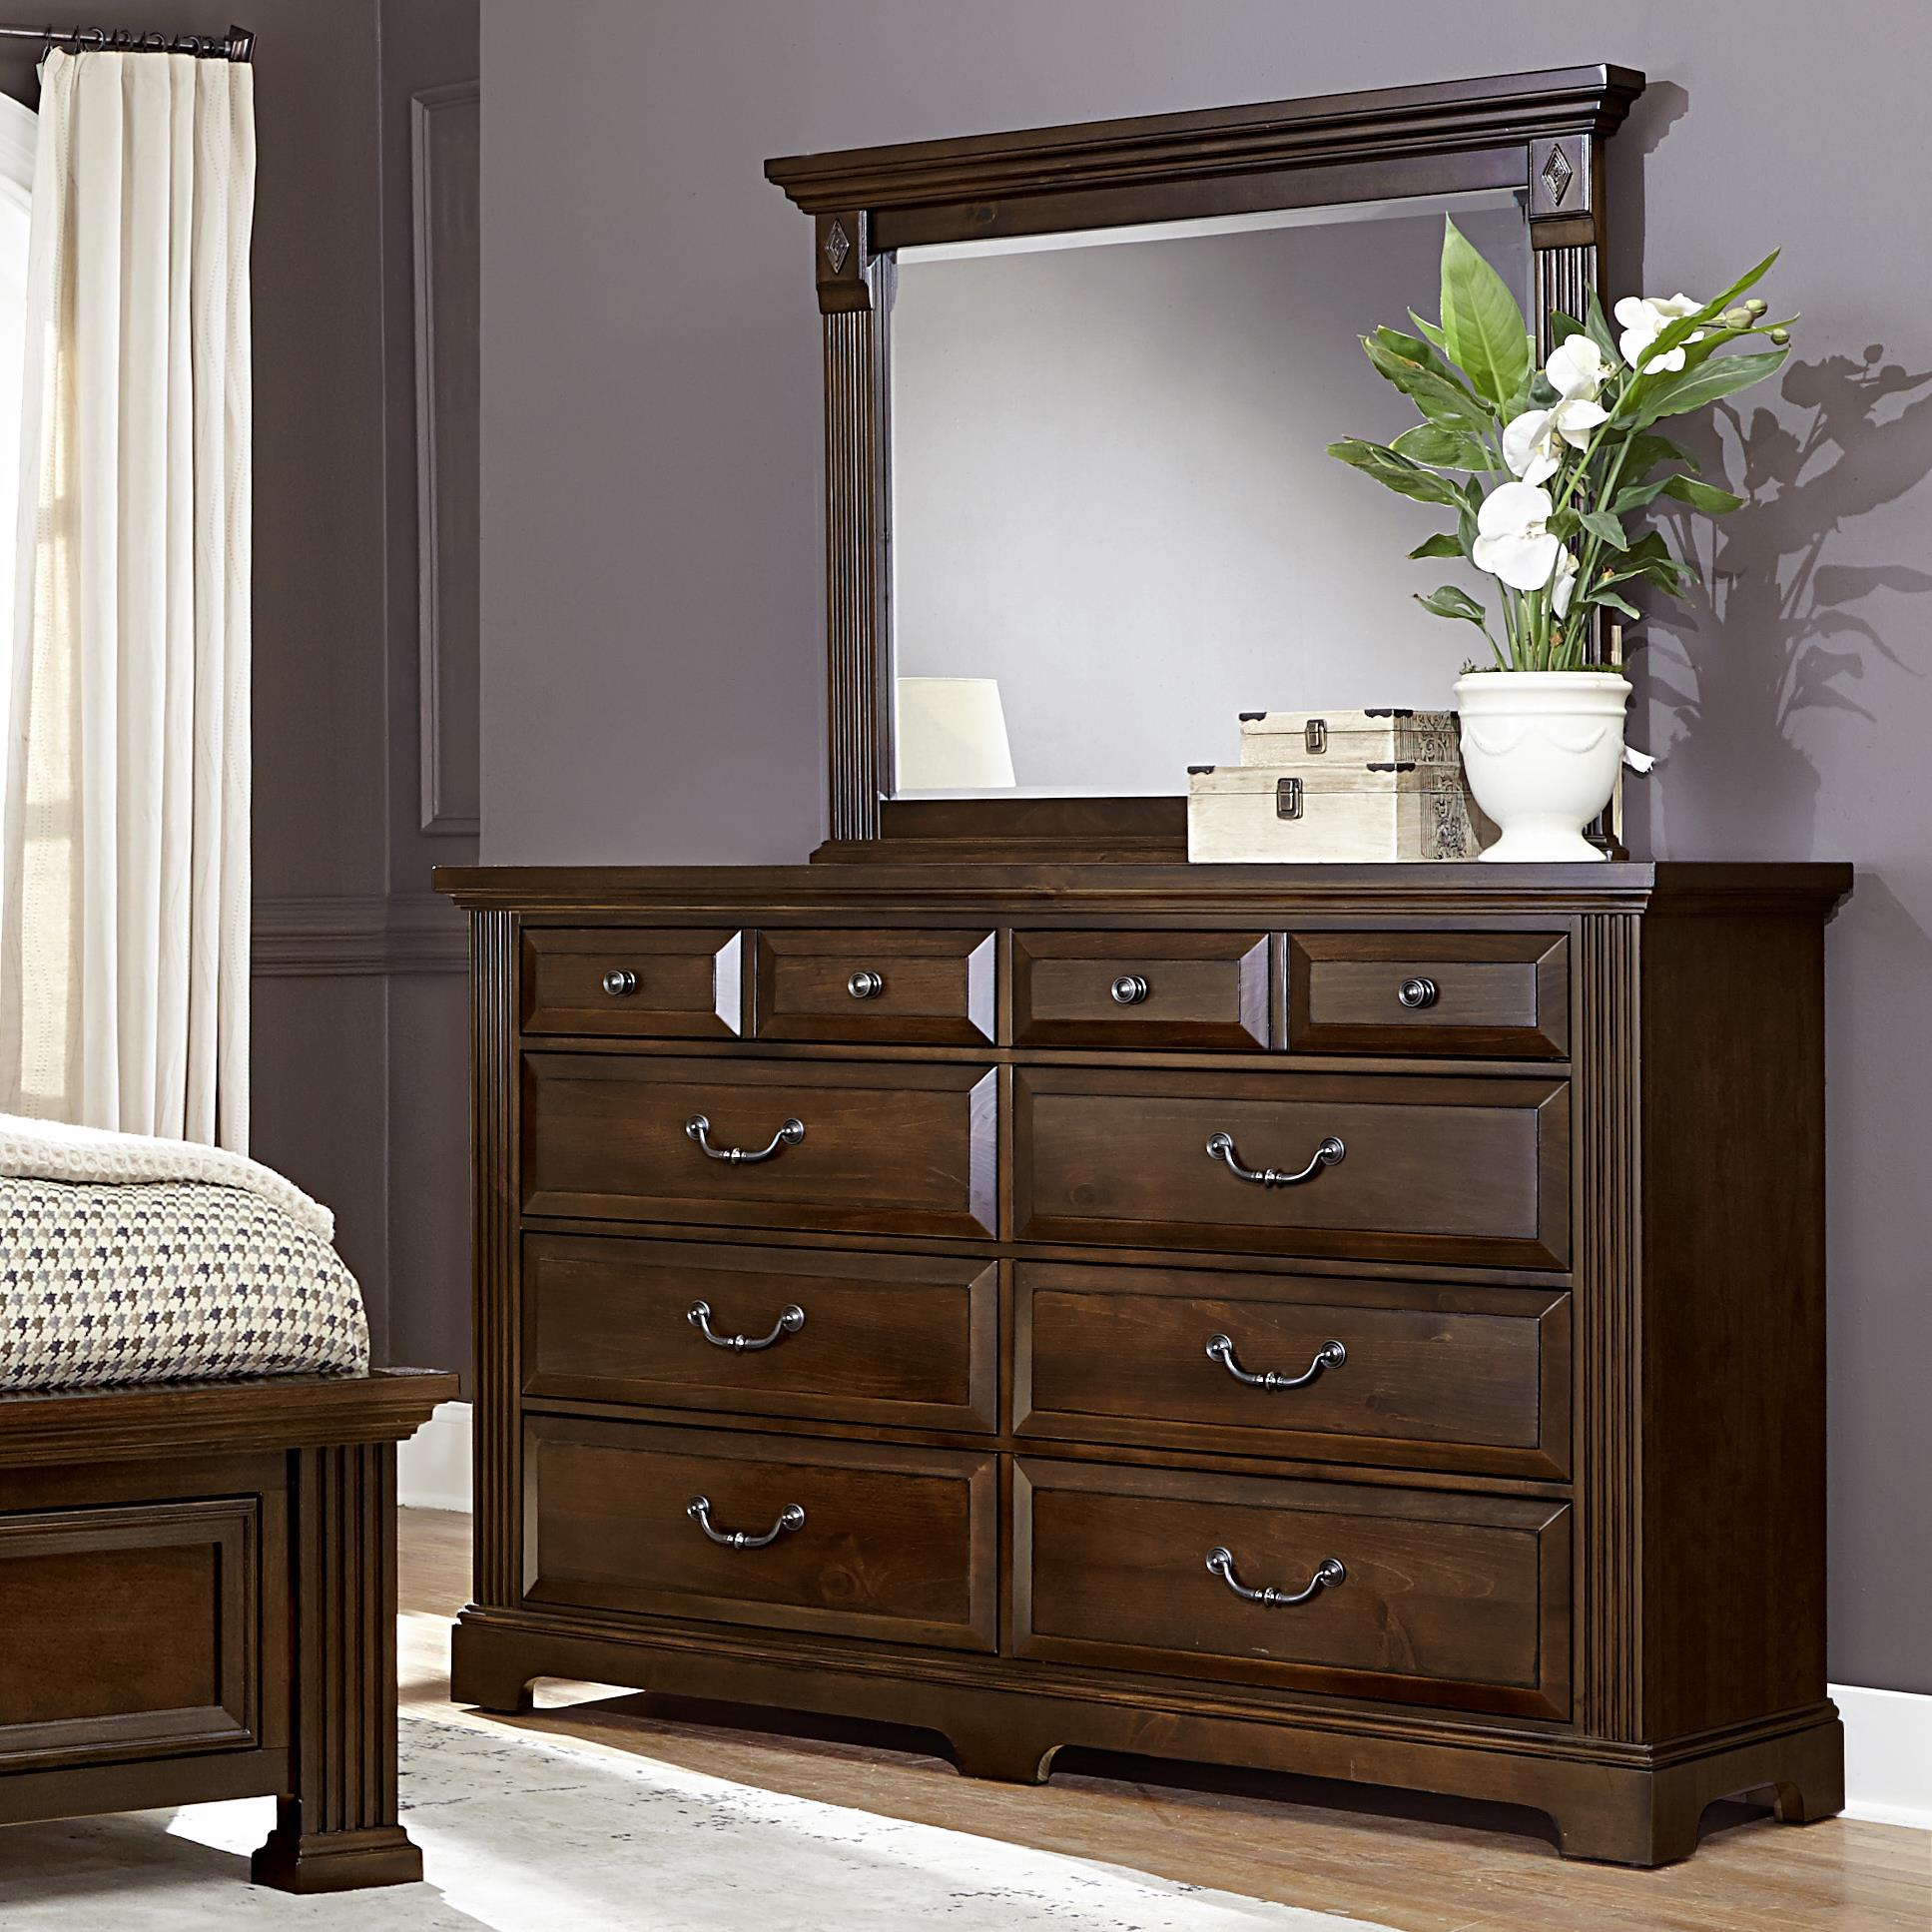 Vaughan Bassett Woodlands Triple Dresser & Landscape Mirror - Item Number: BB98-002+446